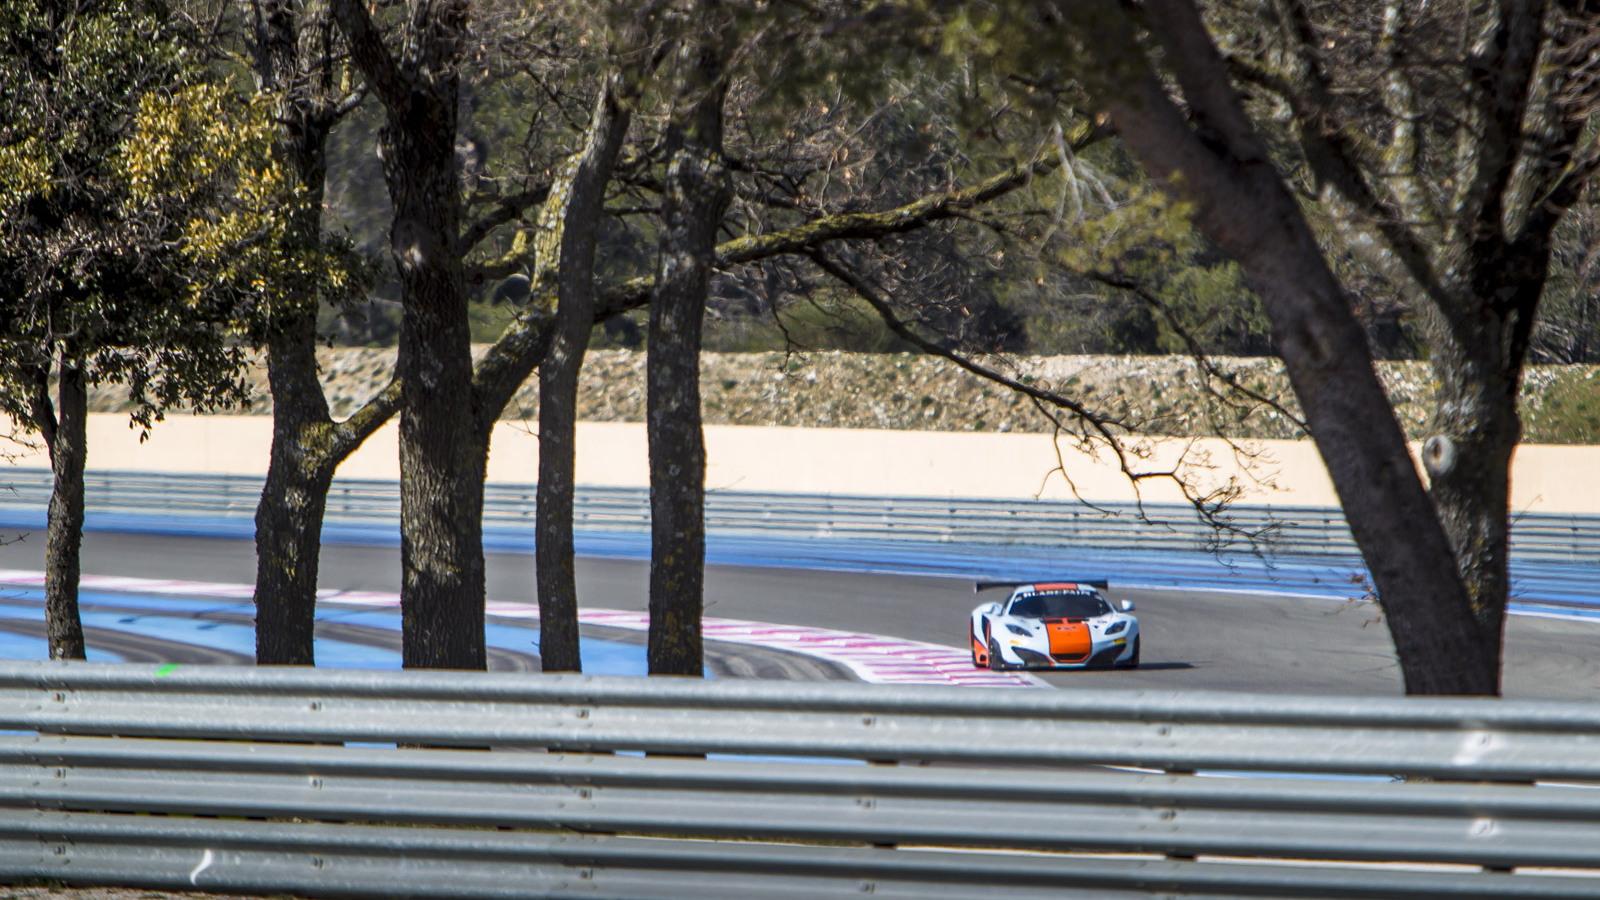 2013 McLaren 12C GT3 race car